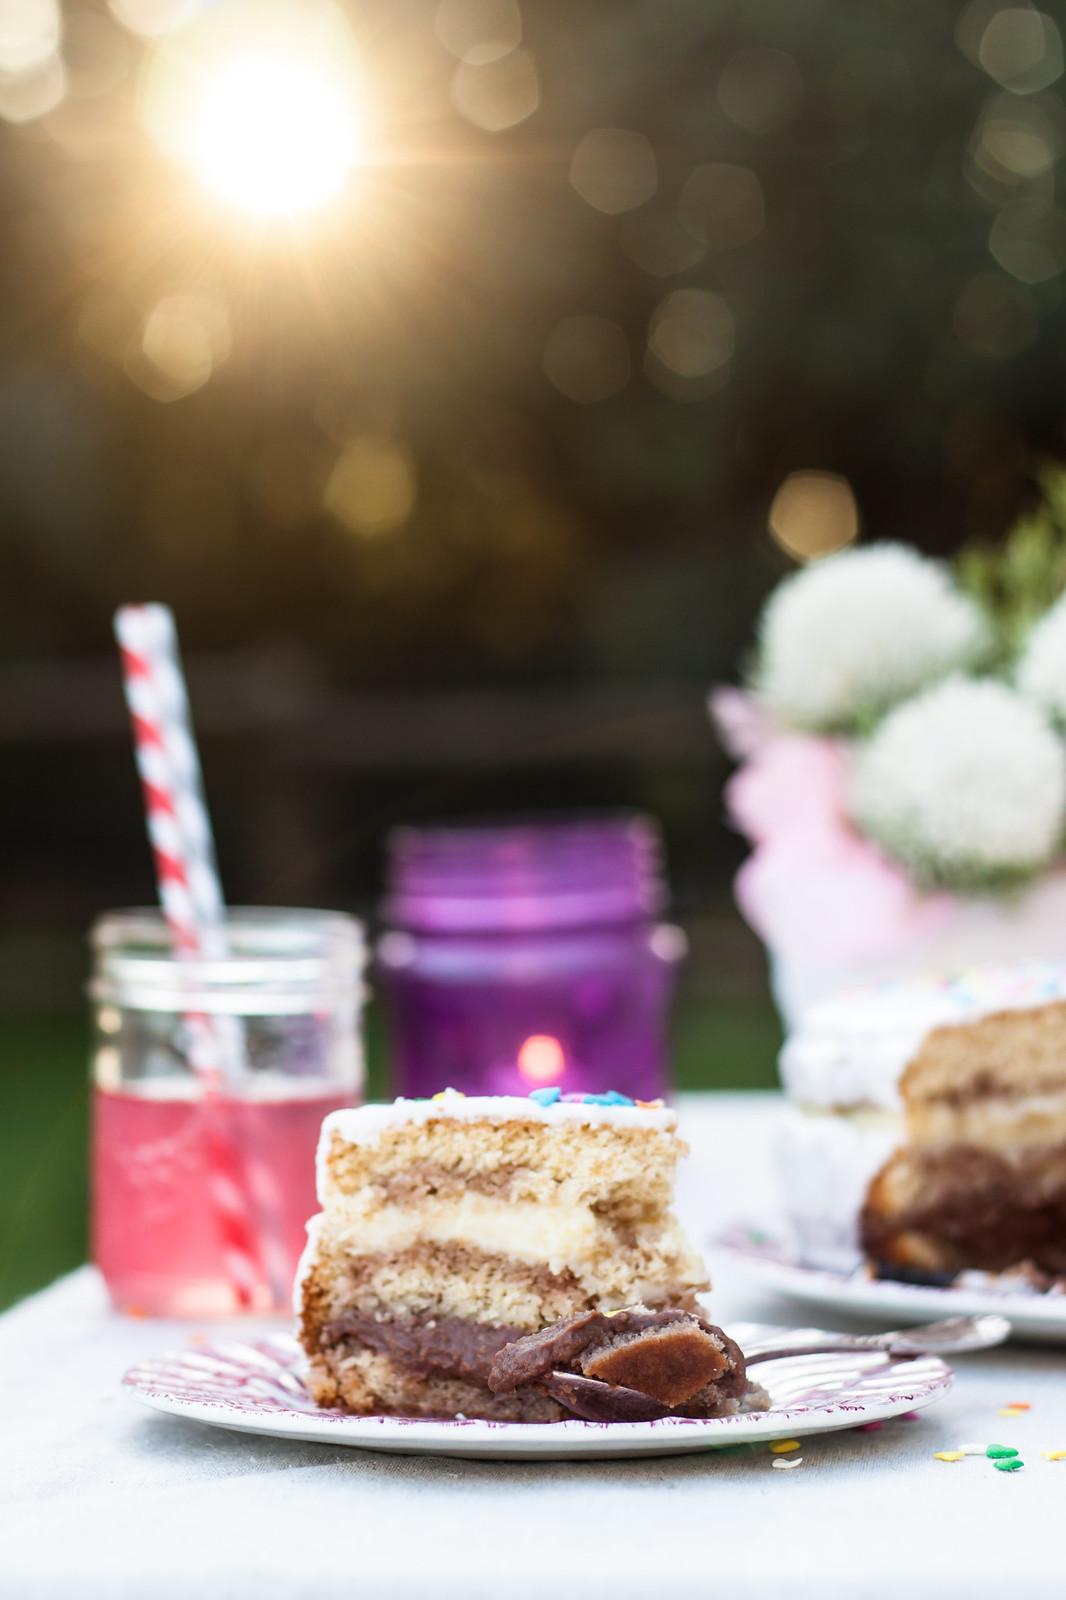 Sponge cake with custard and chocolate